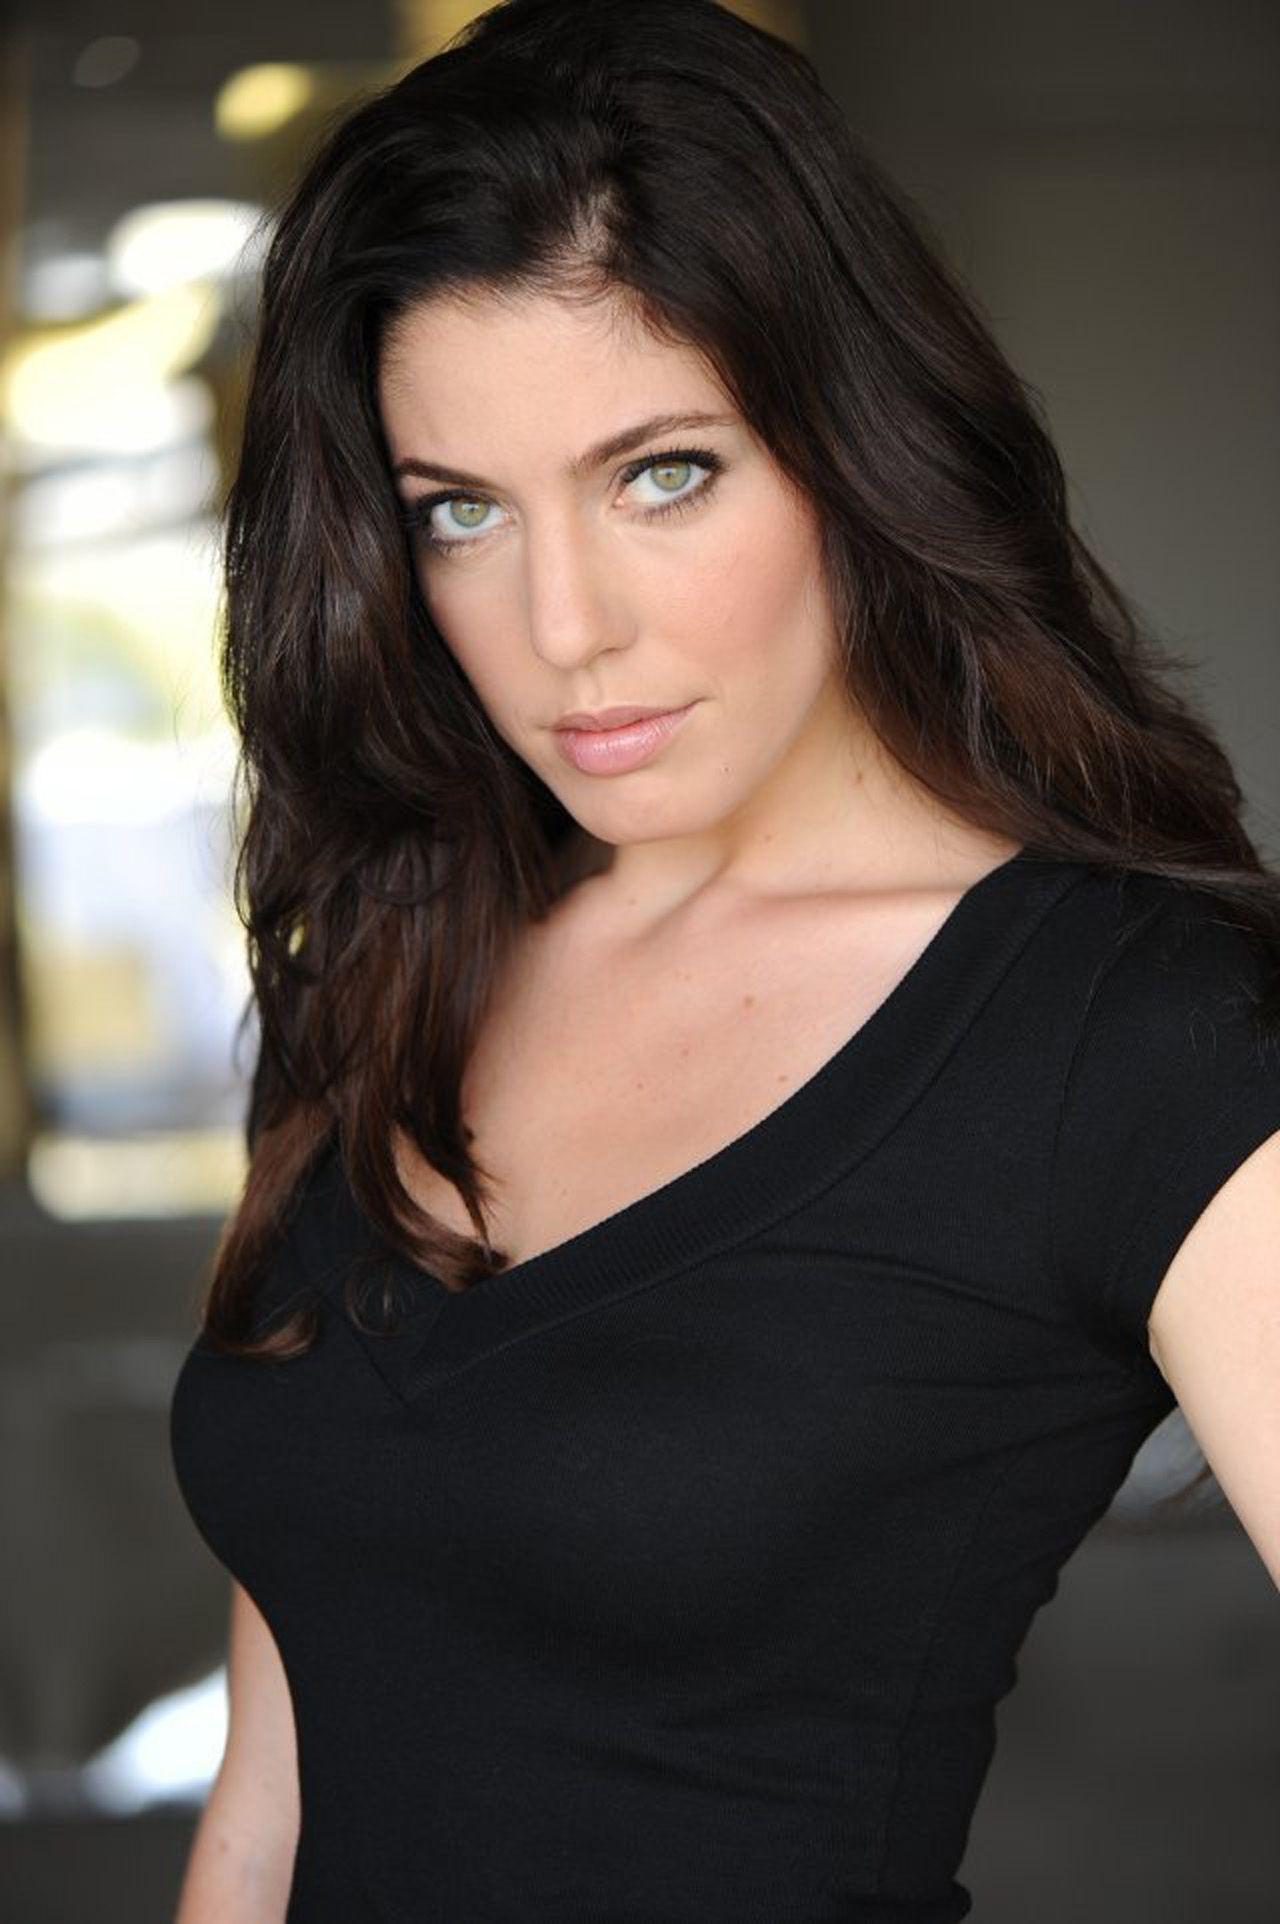 Image result for AMANDA KIMMEL IMDB